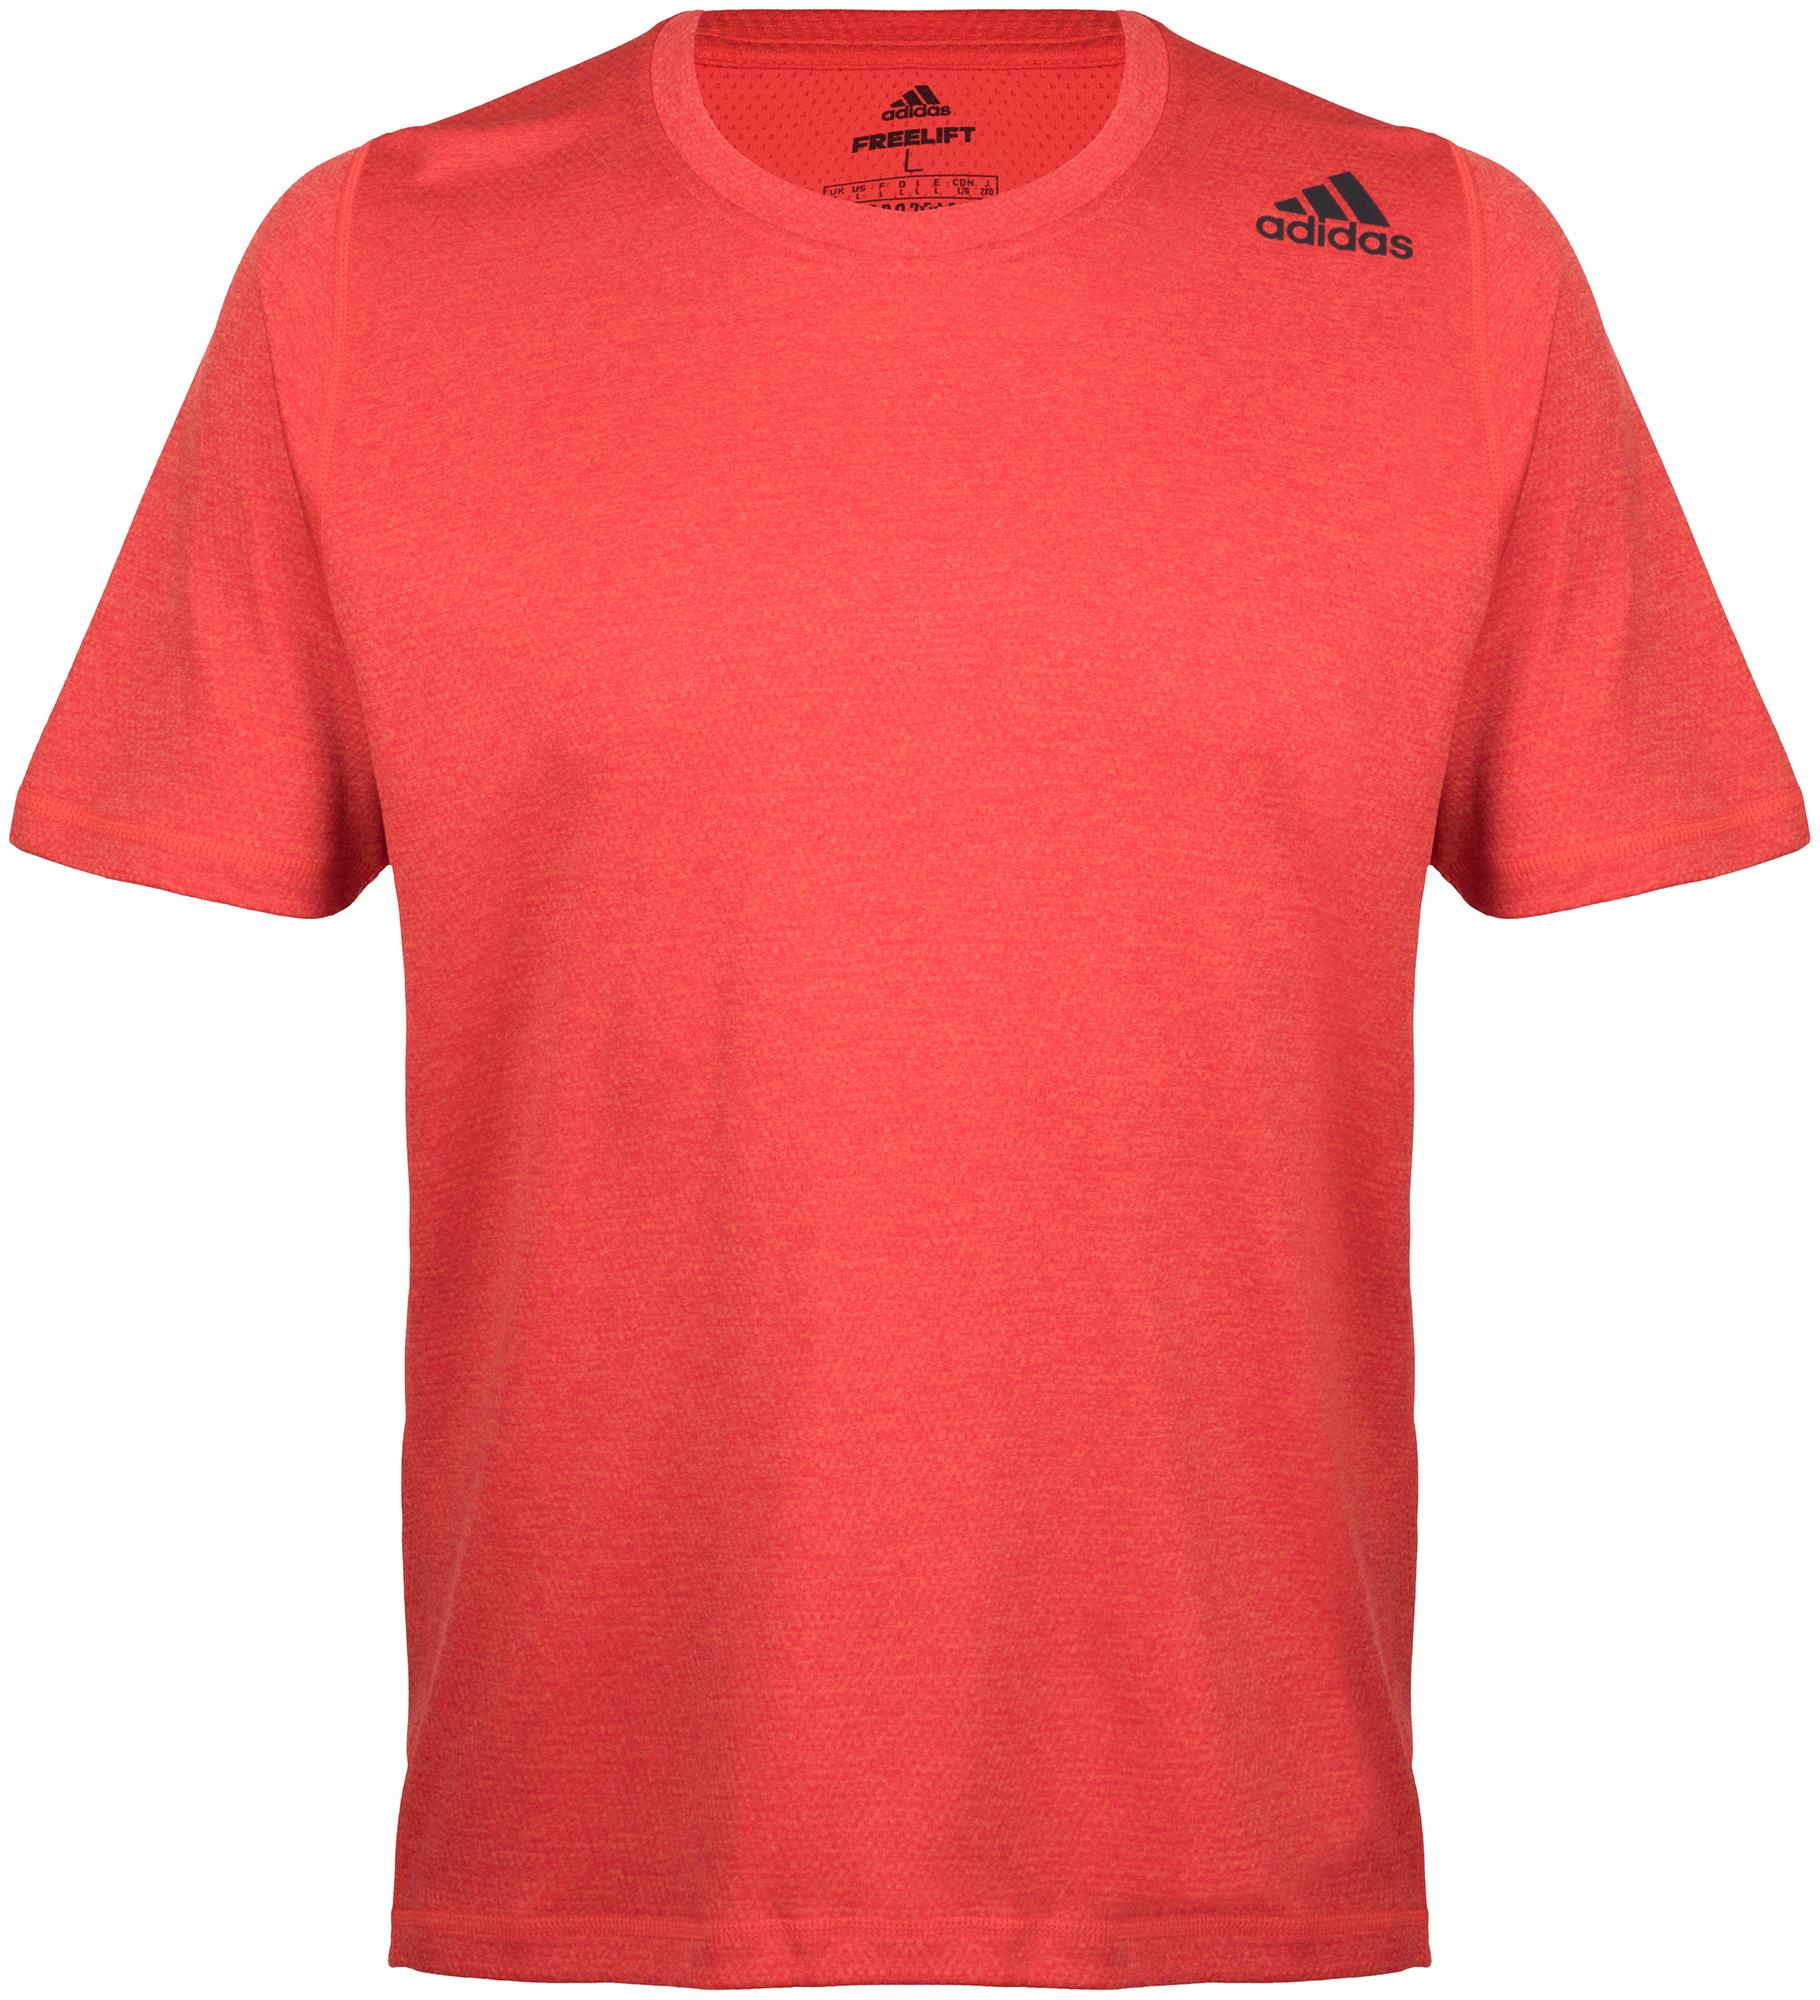 Adidas Футболка мужская Adidas FreeLift, размер 48-50 adidas футболка freelift grad linkha